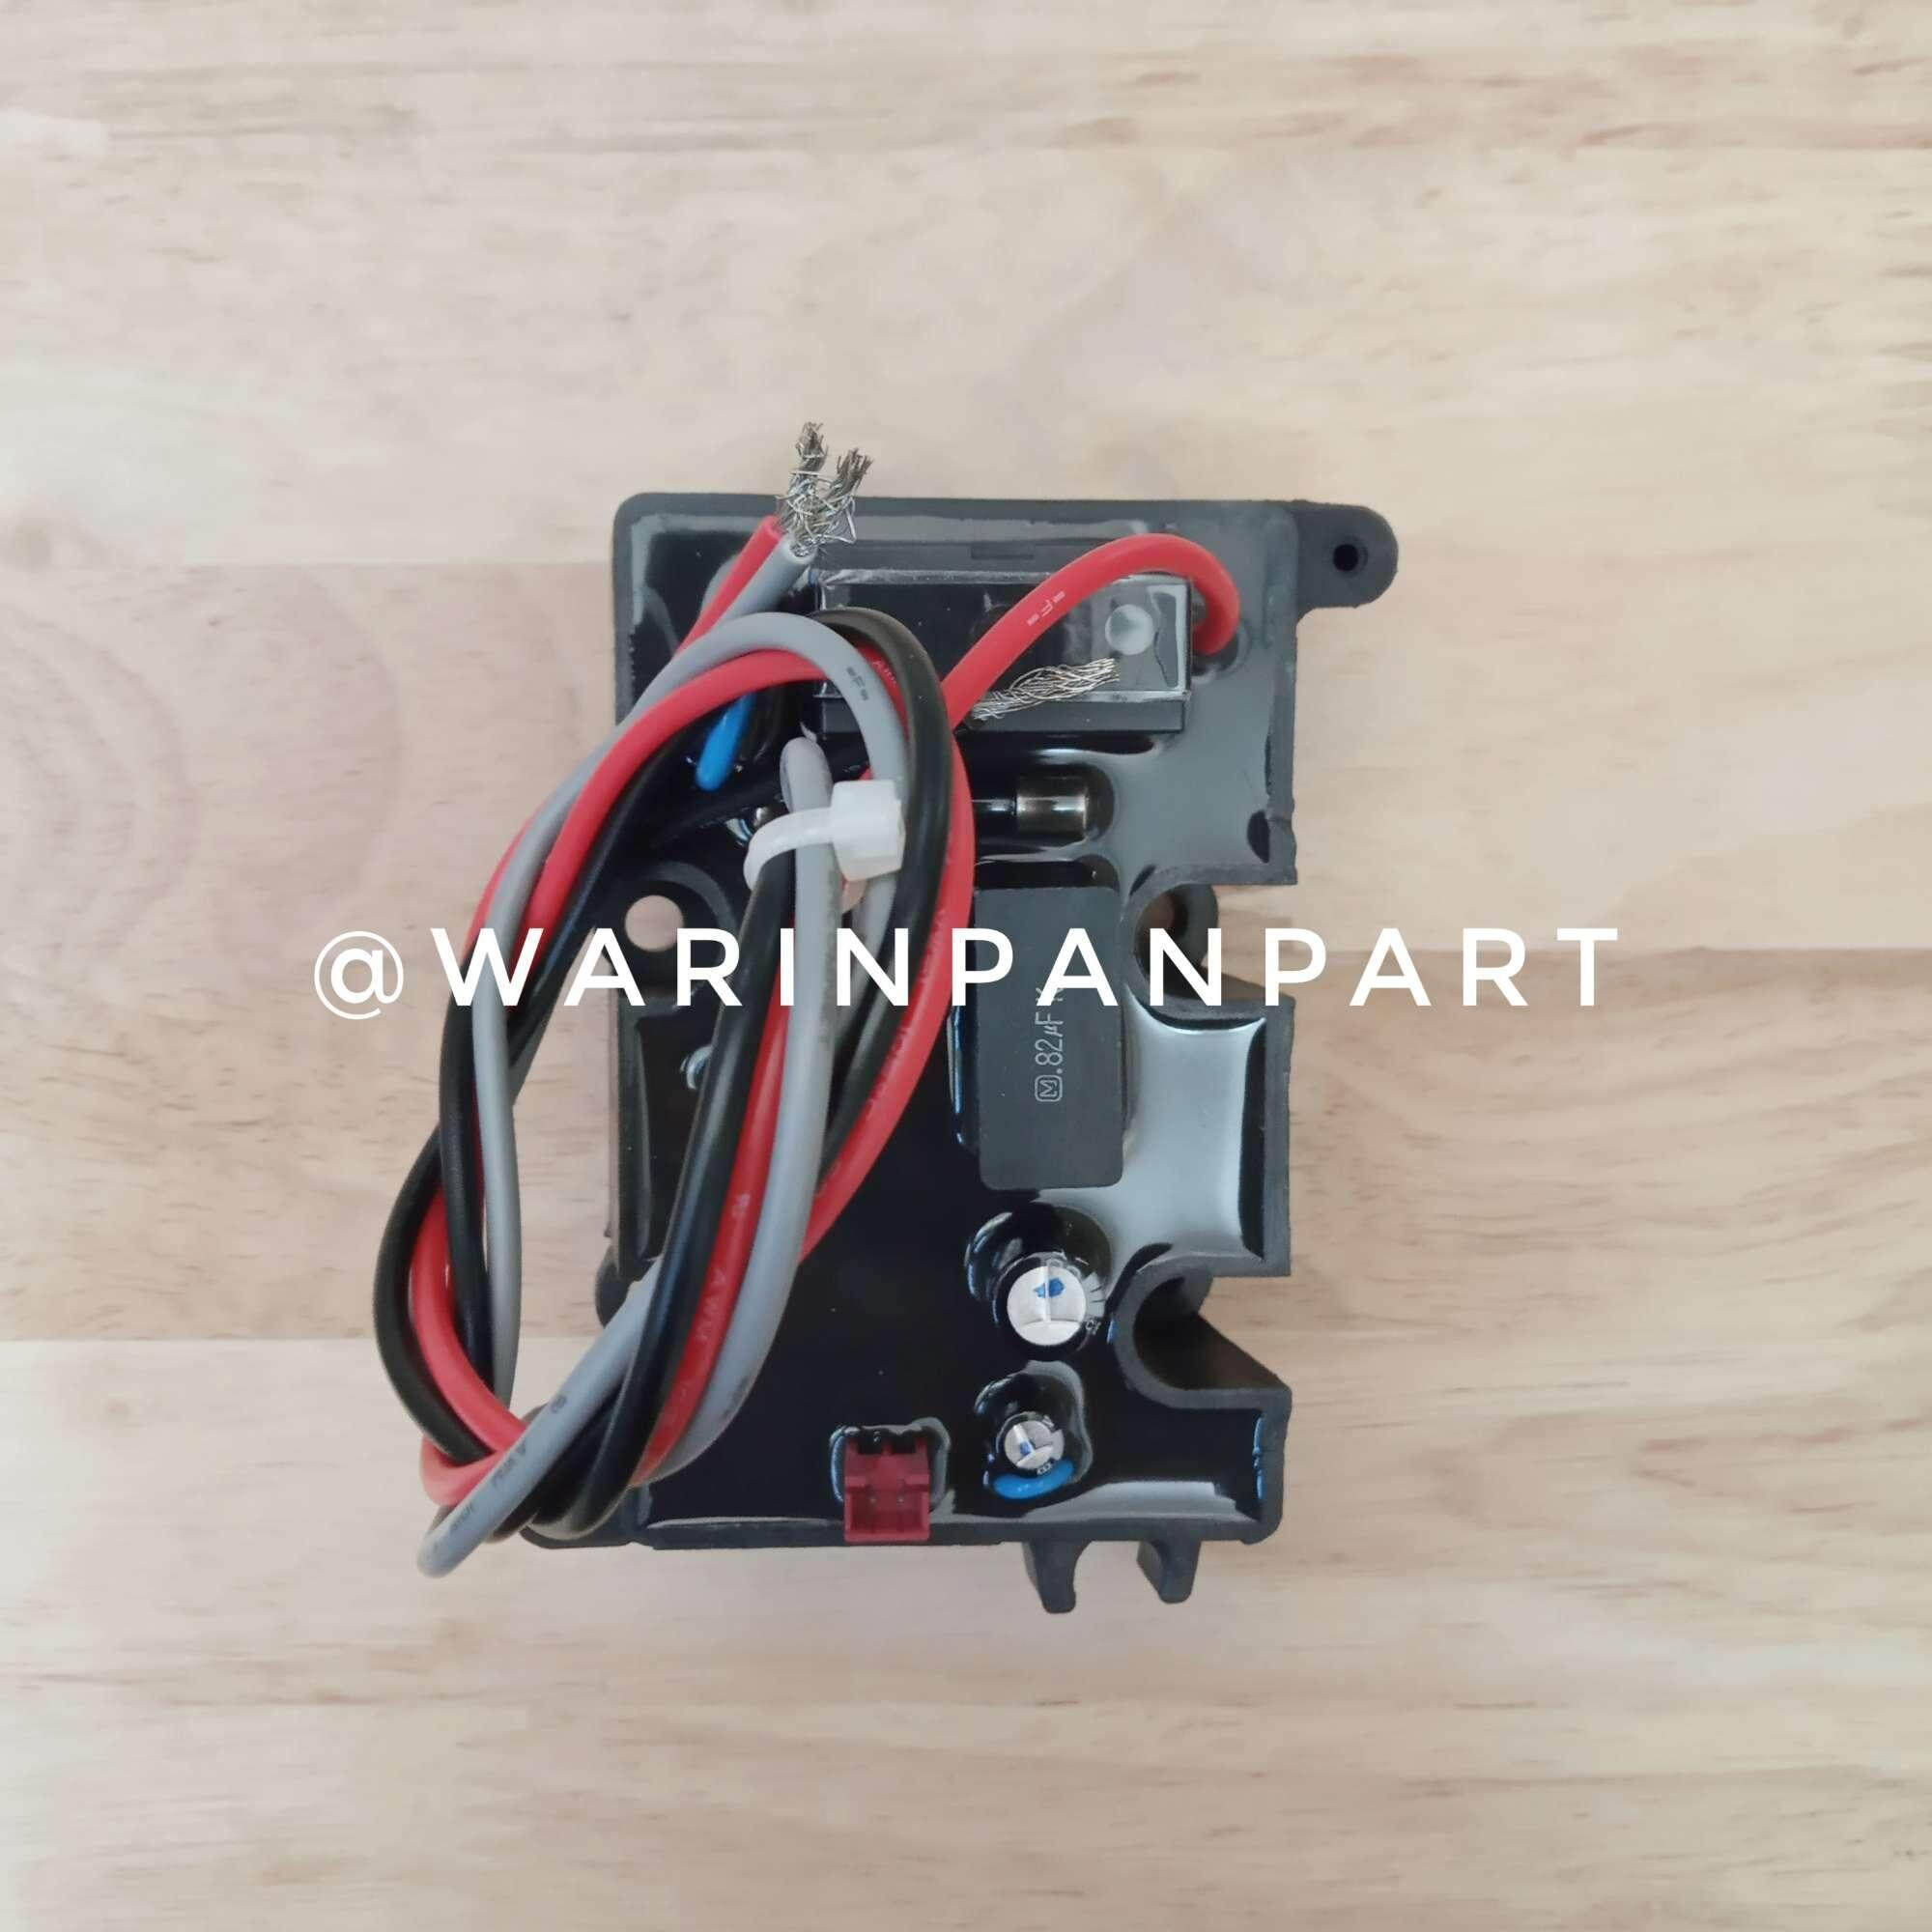 Flow Switch Mitsubishi 80-350 Q และ R ปั๊มแรงดันคงที่ อะไหล่ปั๊มน้ำ